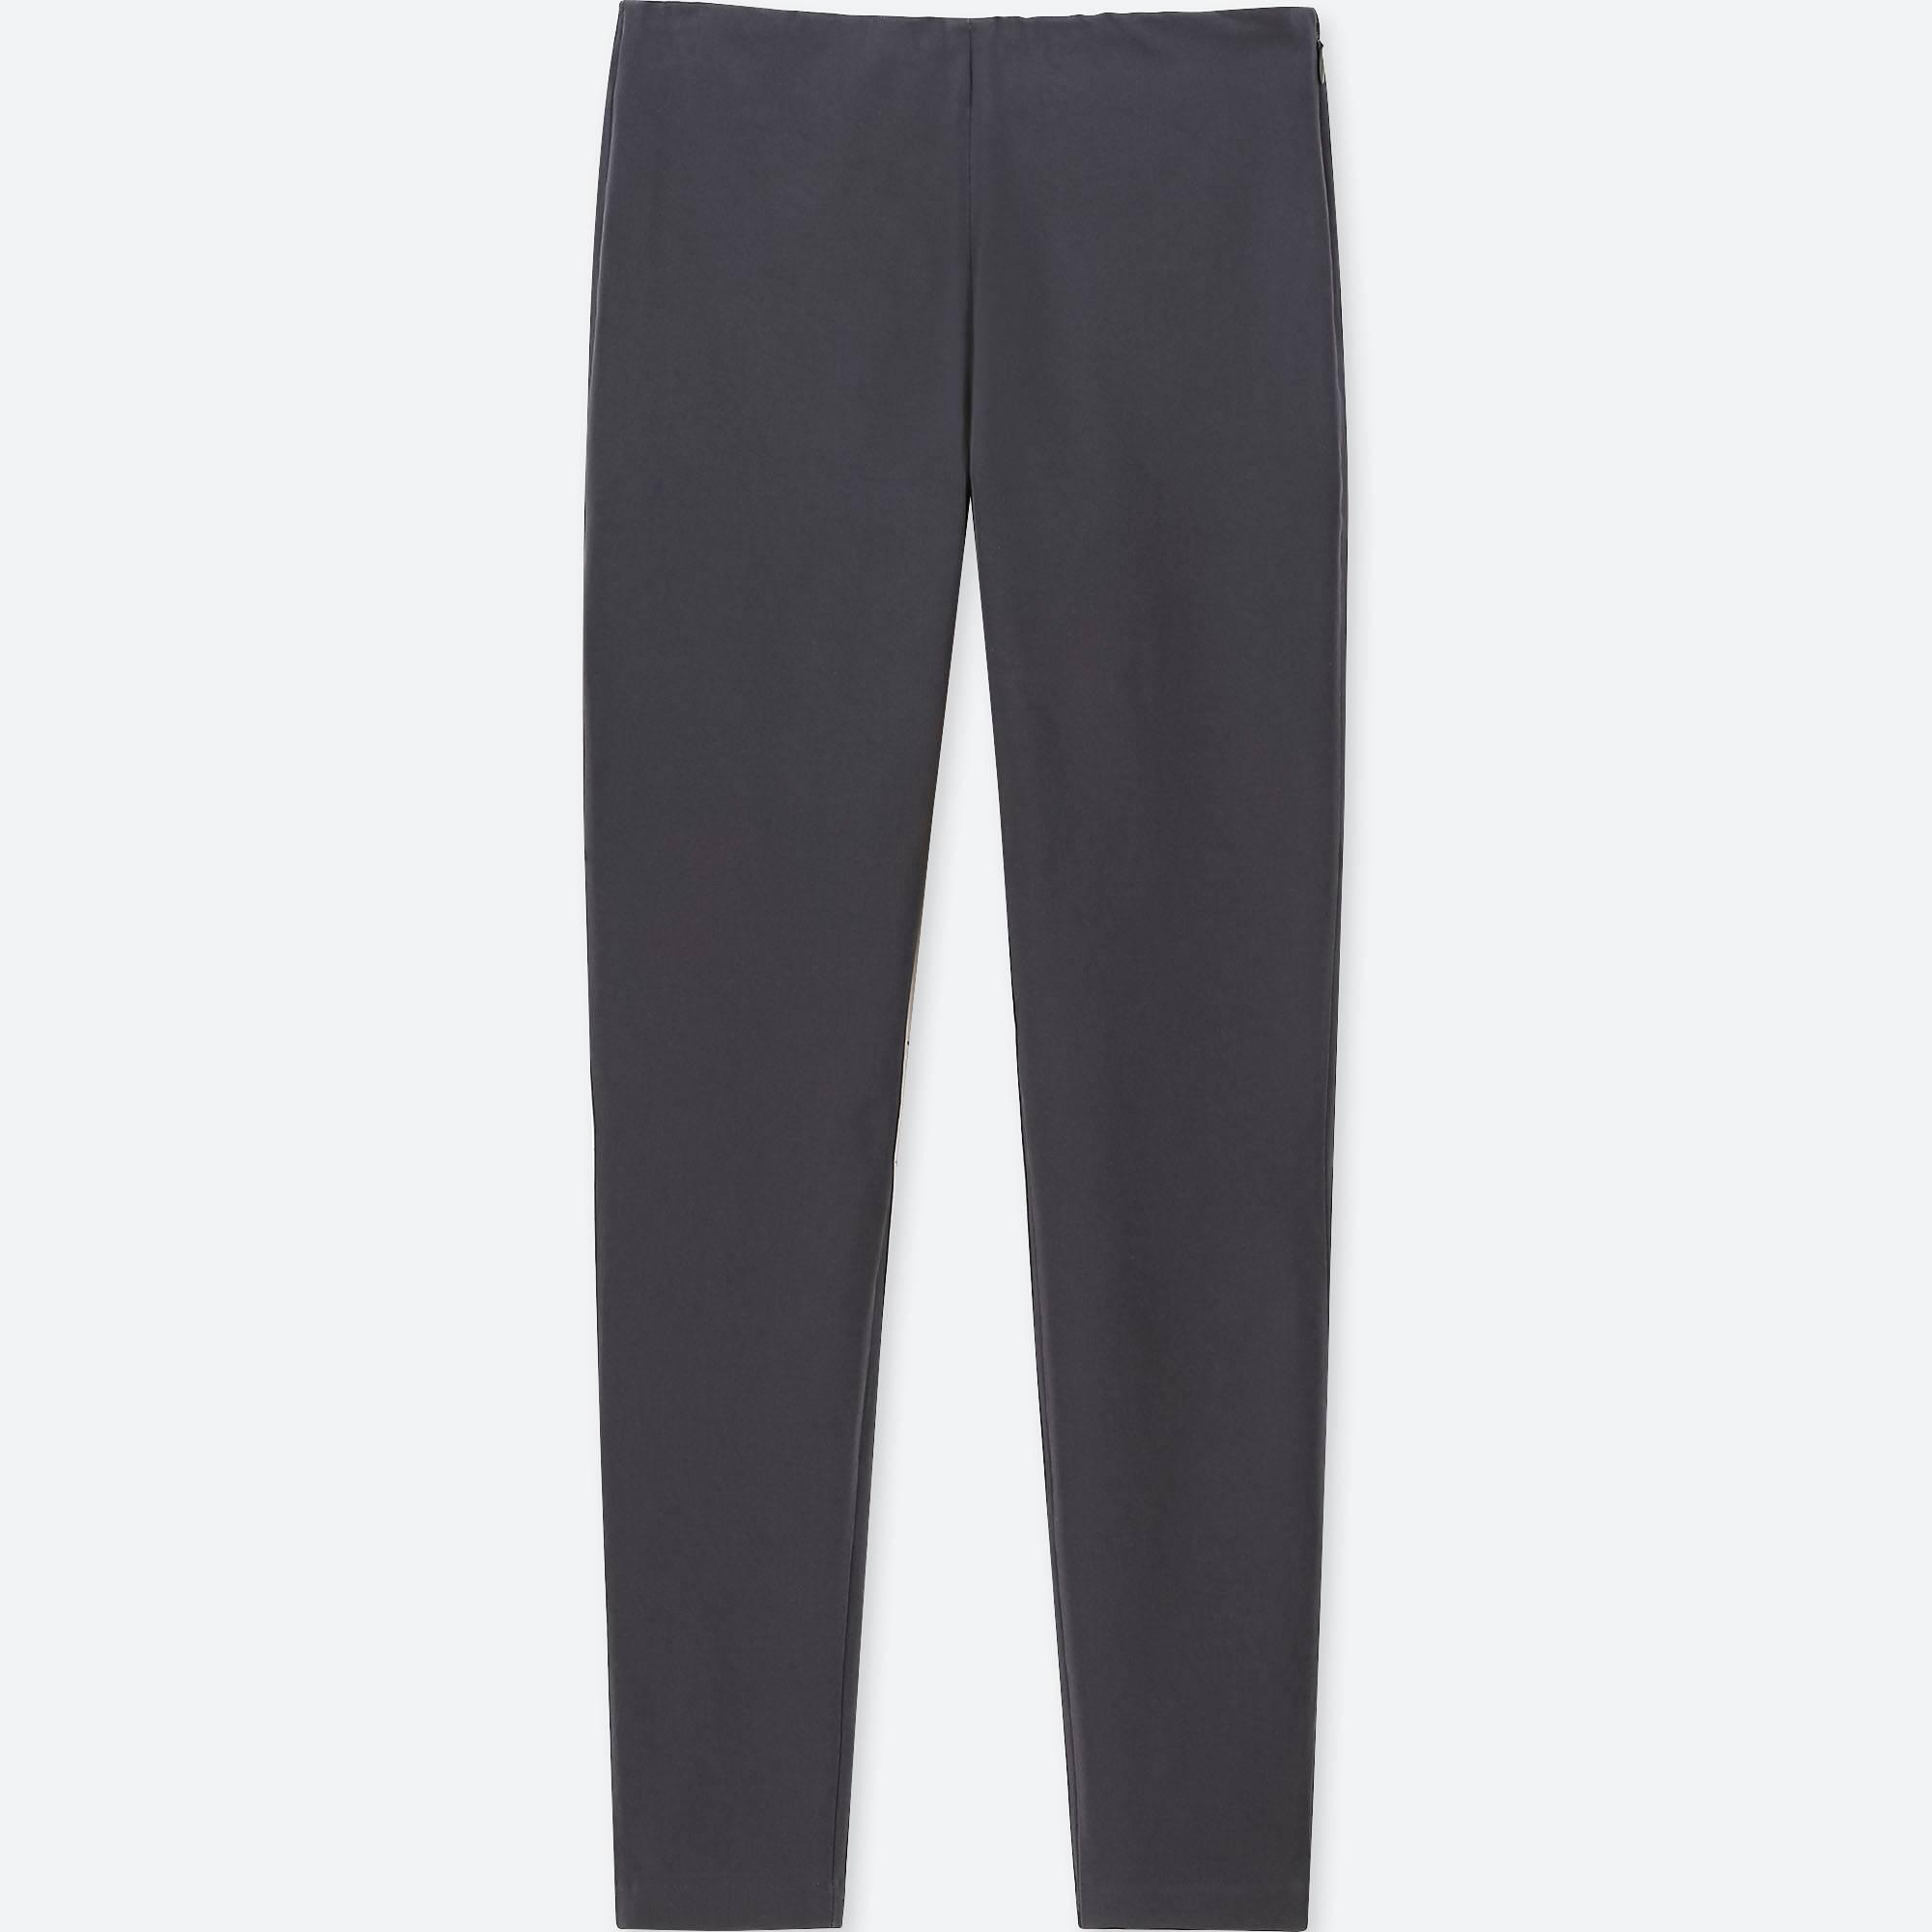 6ed43c5a01d33 Uniqlo - Gray Smart Ankle Length LEGGINGS Trousers - Lyst. View fullscreen